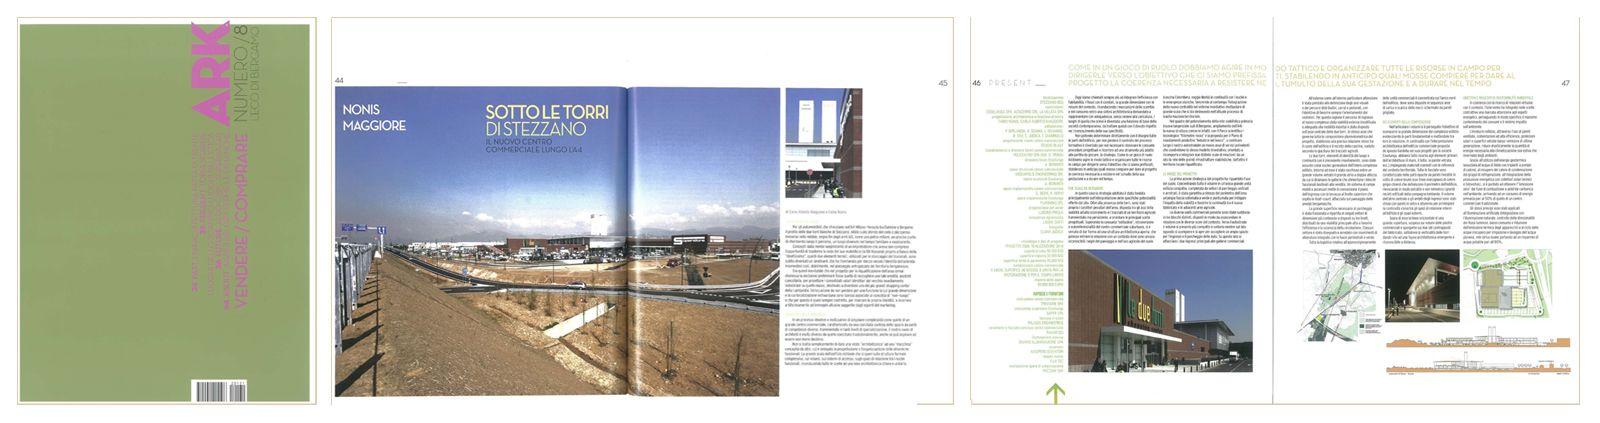 ARK numero 8, Gennaio 2012